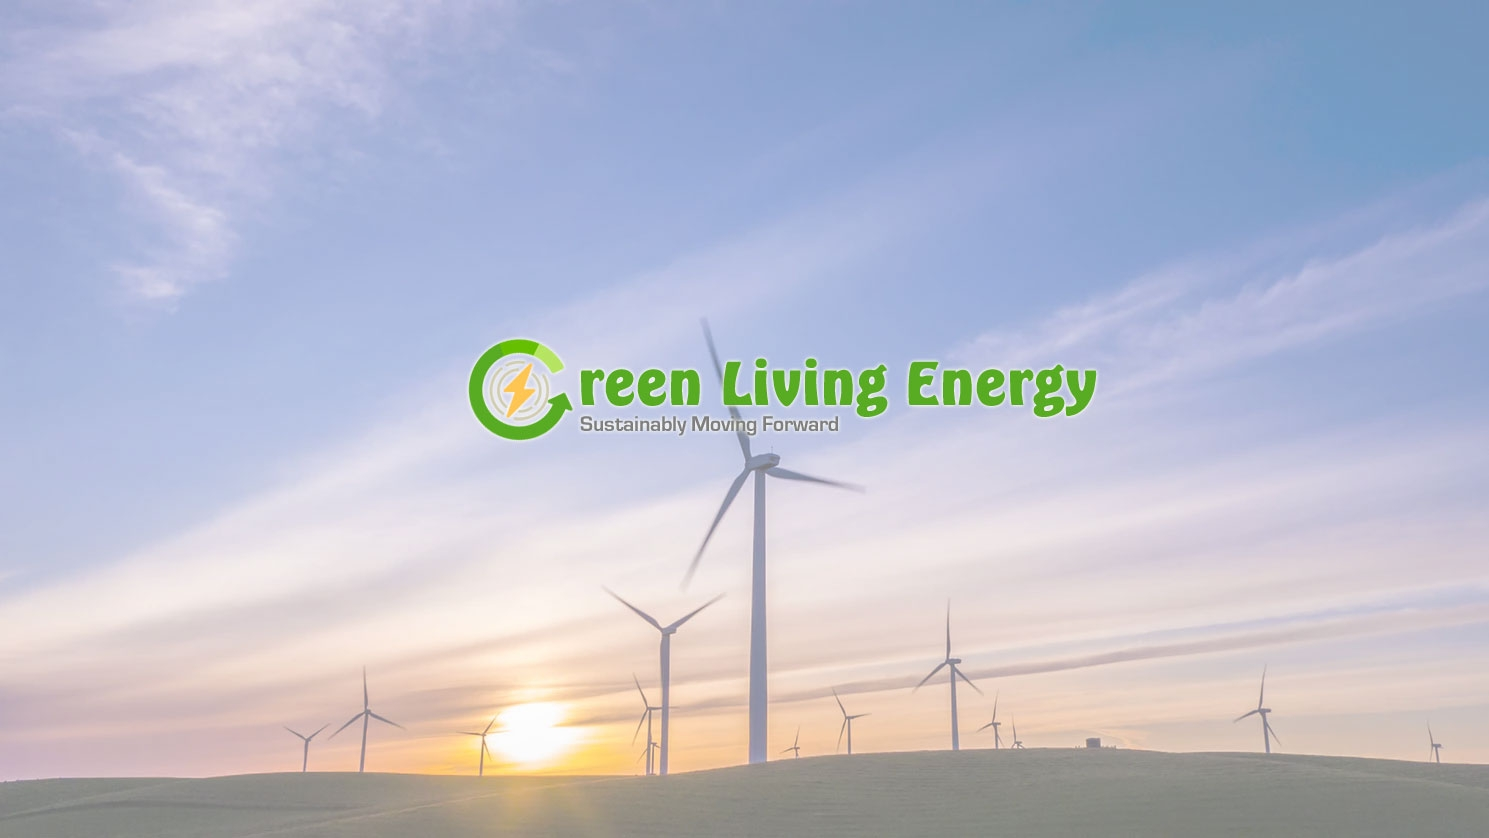 greenlivingenergy2018 (@greenlivingenergy2018) Cover Image